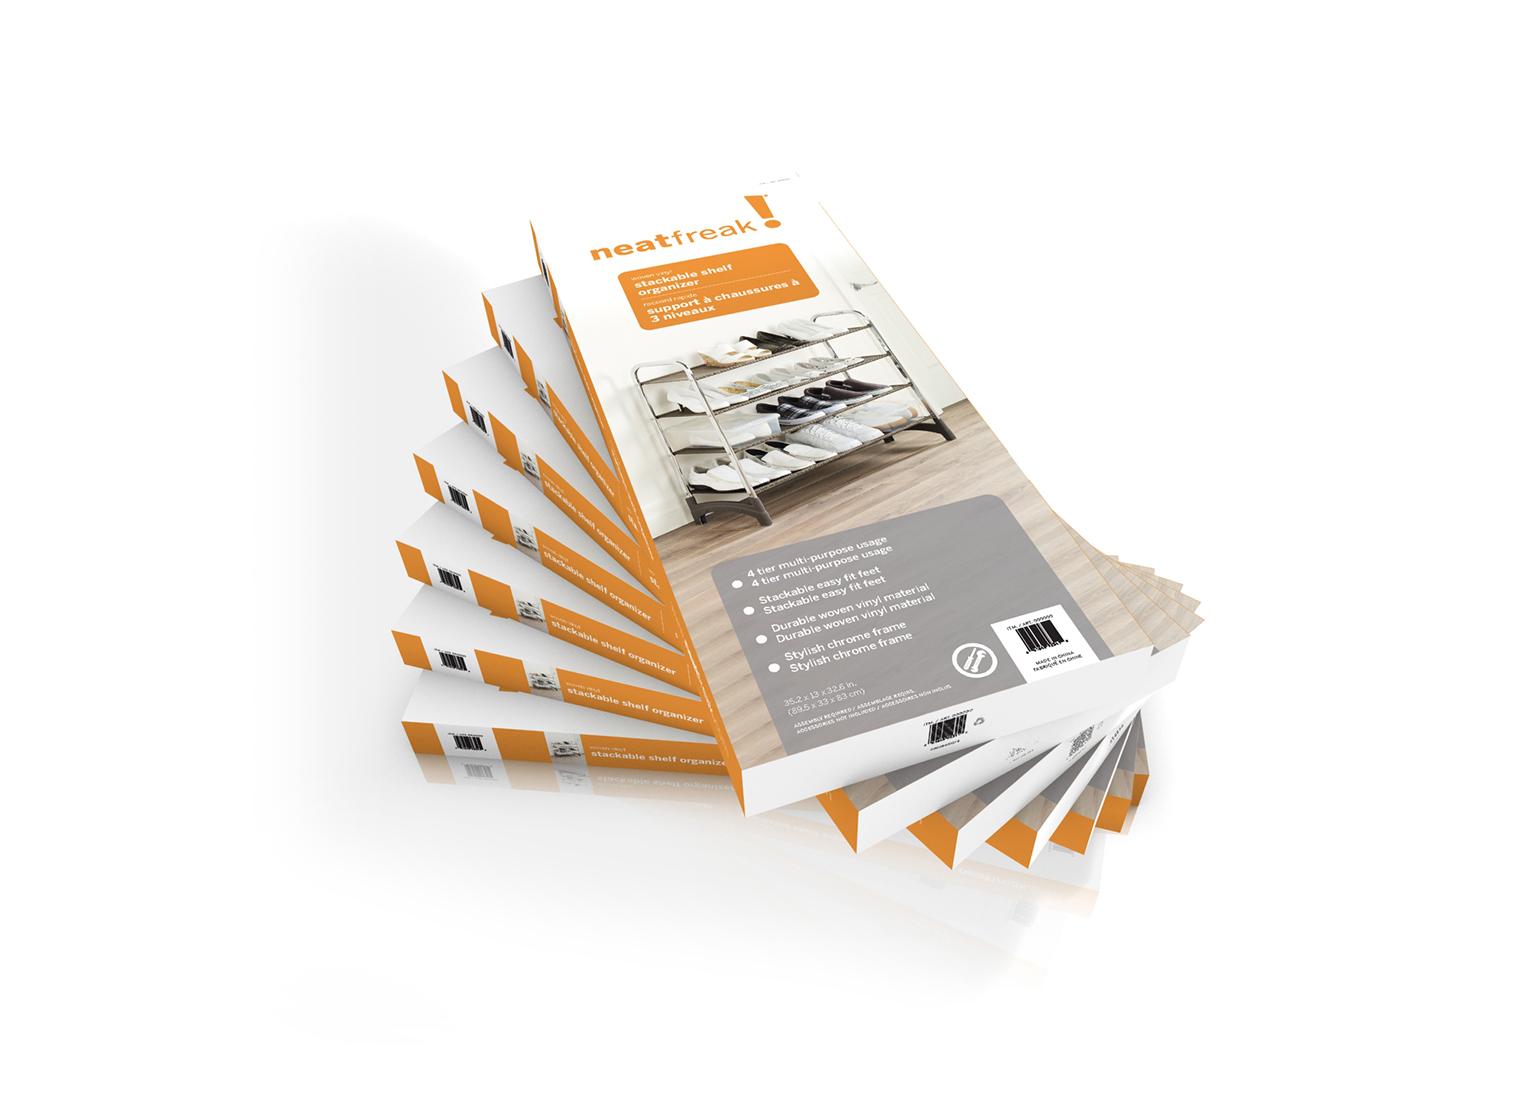 Copy of 3D Rendering Box Design